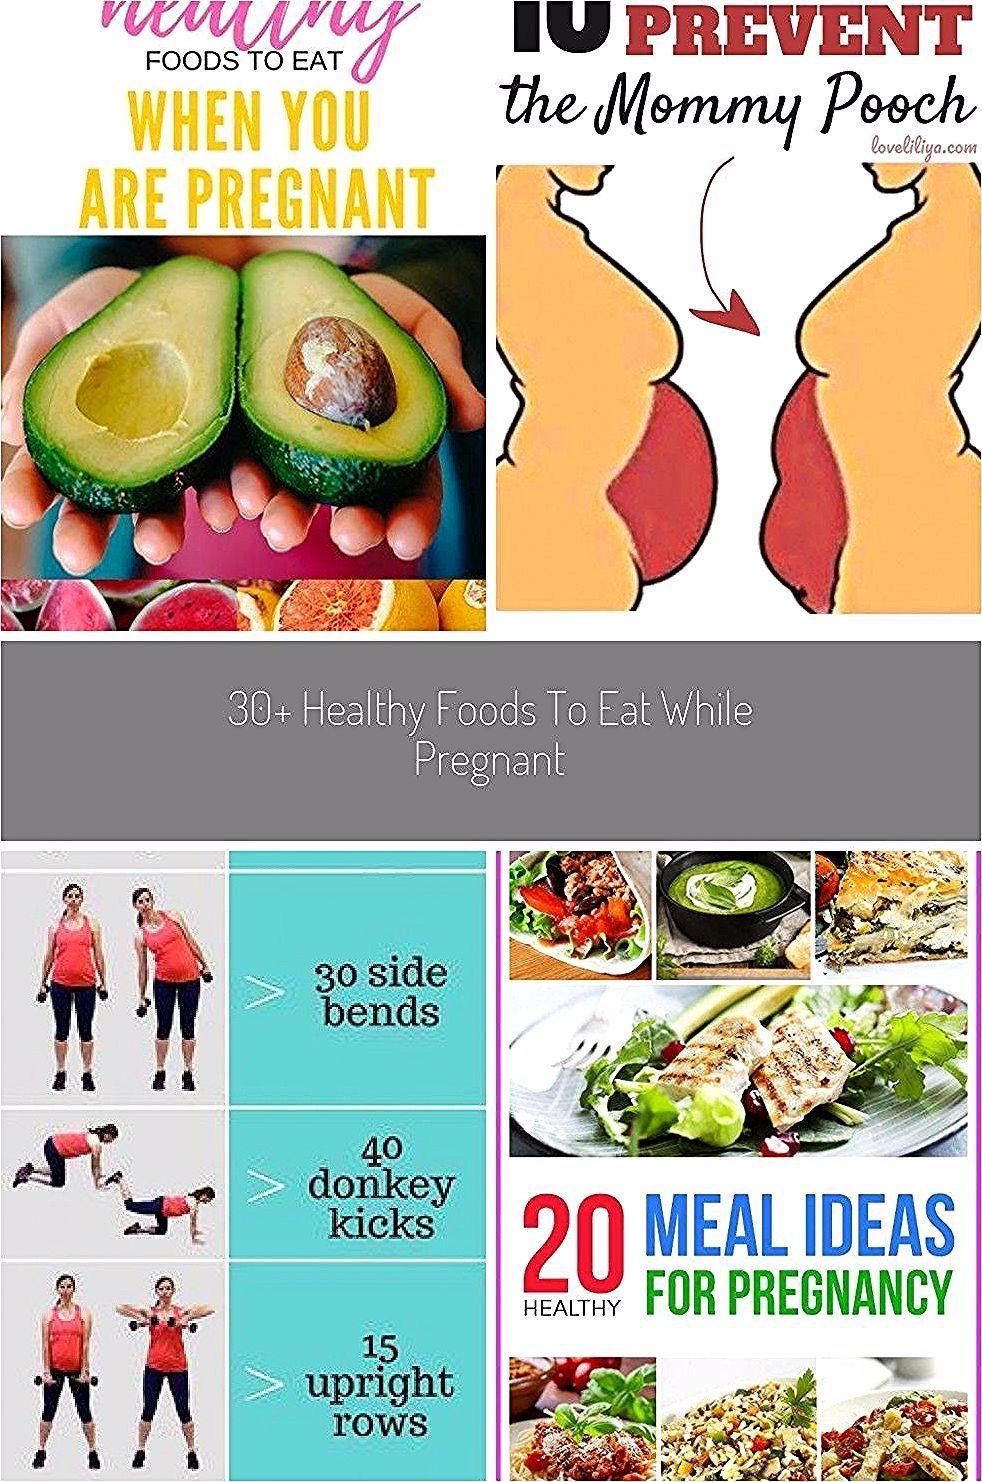 Gesunde Ernährung während der Schwangerschaft muss nicht einschränkend sein. Hier…   – Selena Block II